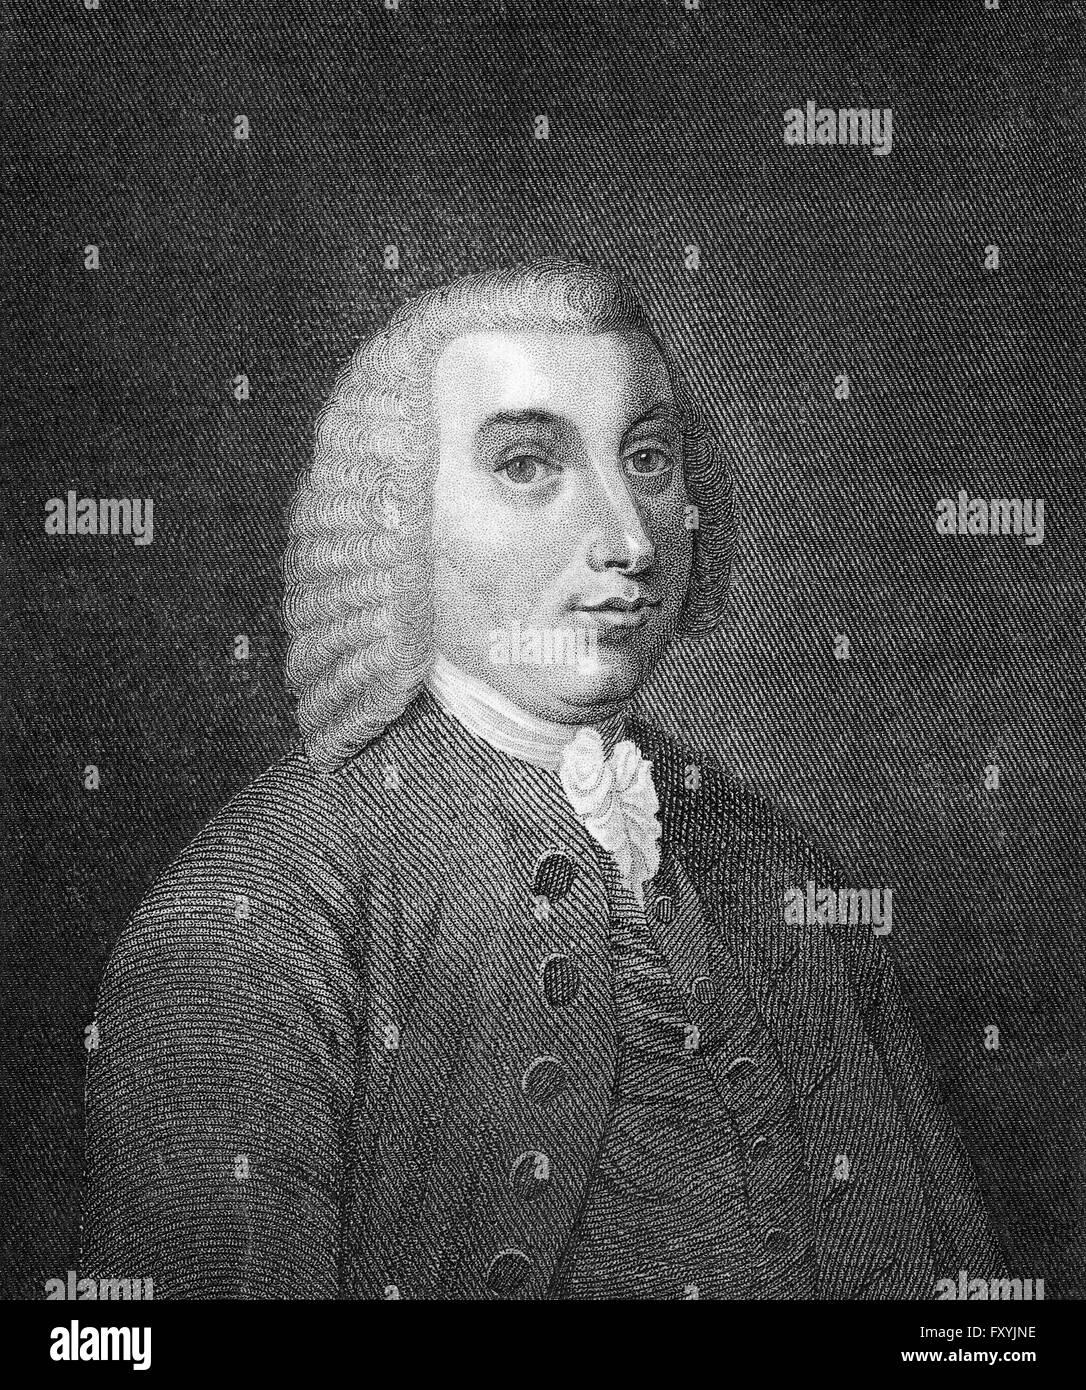 Tobias George Smollett, 1721-1771, a Scottish poet and author, Tobias George Smollett, 1721-1771, ein schottischer - Stock Image